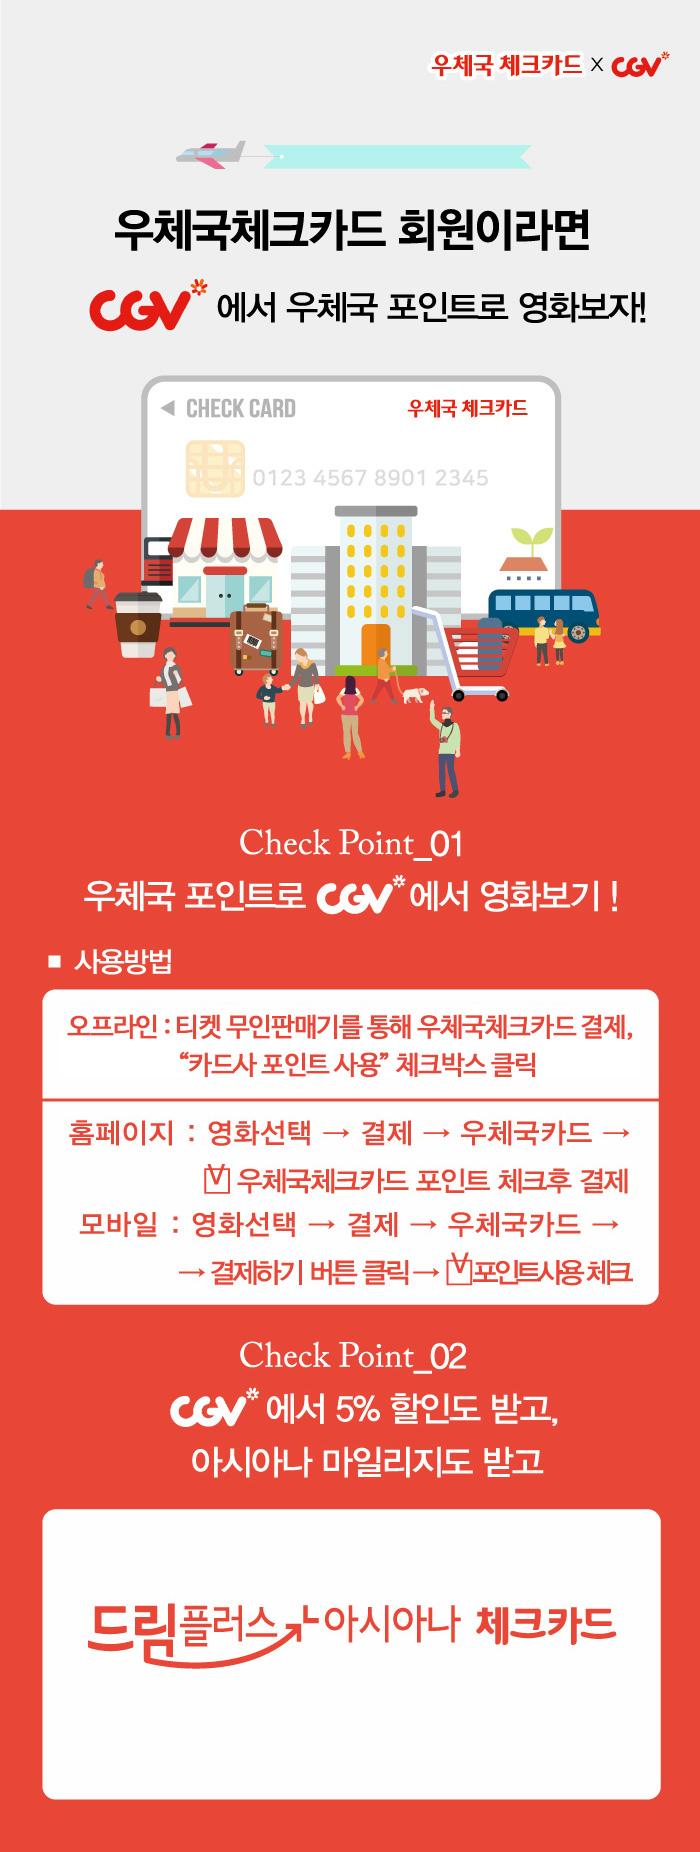 PUB이벤트 우체국 체크카드 회원이라면 CGV에서 할인 받자!